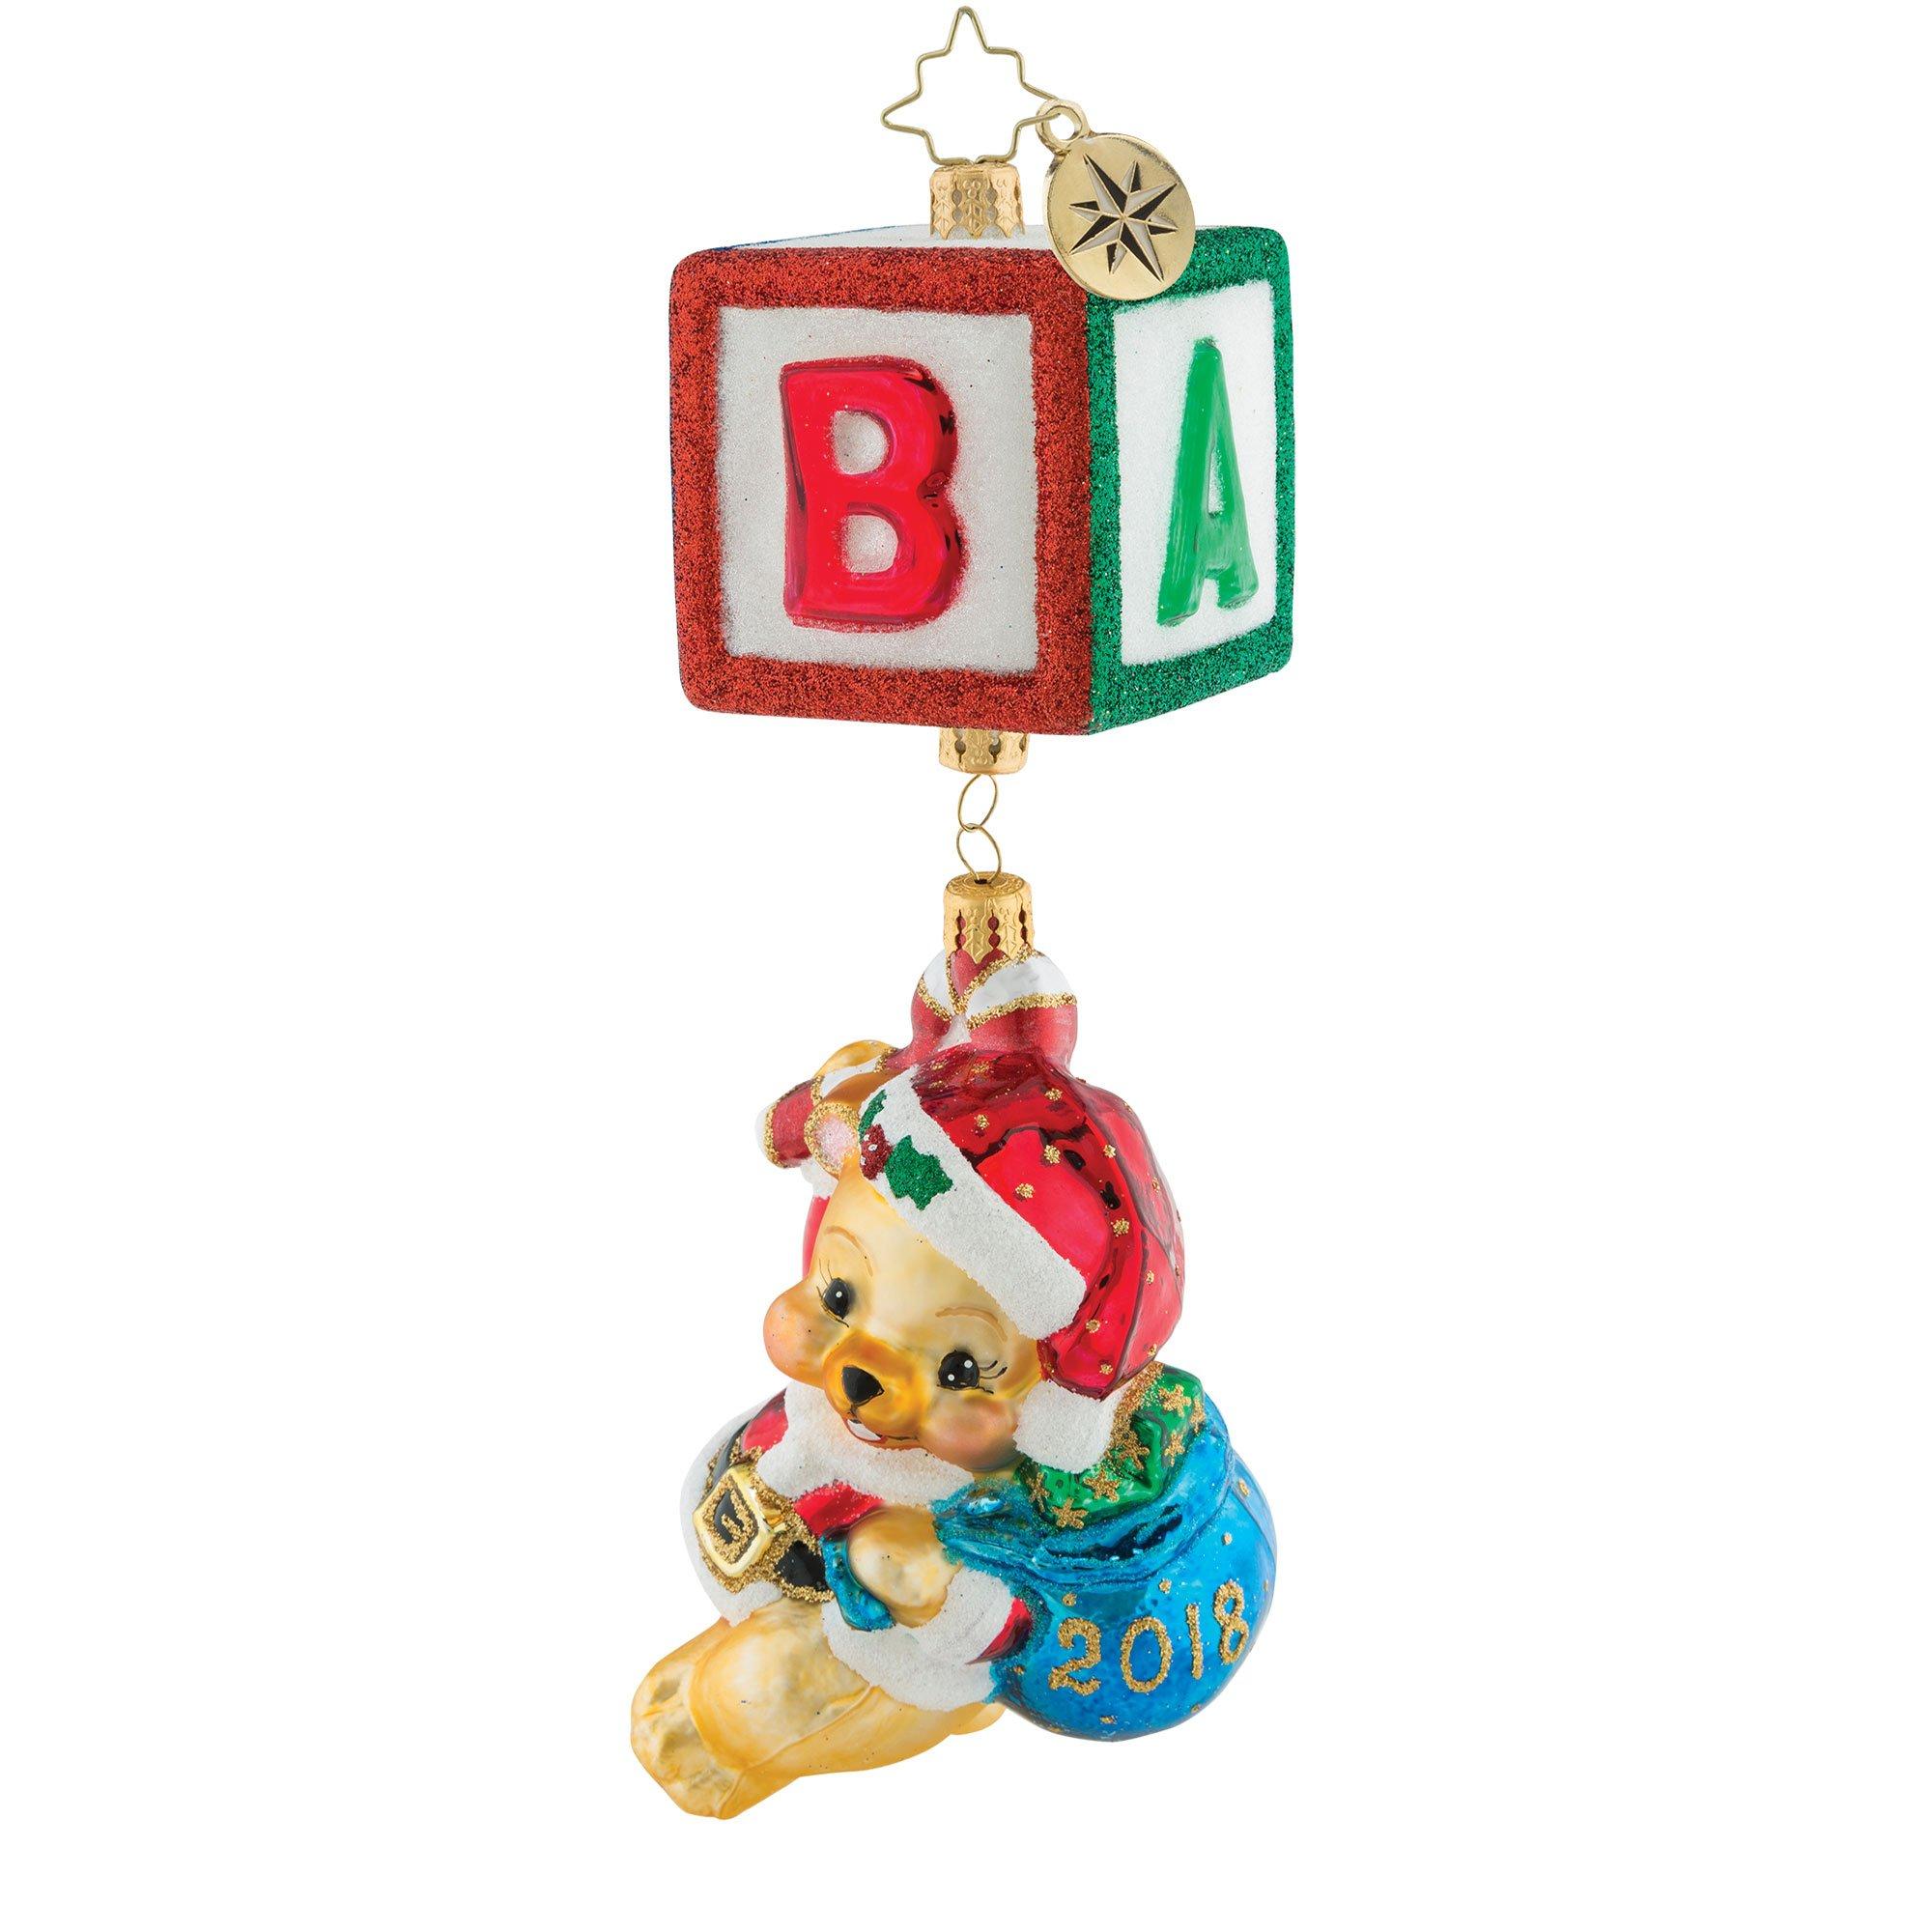 Christopher Radko Bear Block Party Christmas Ornament